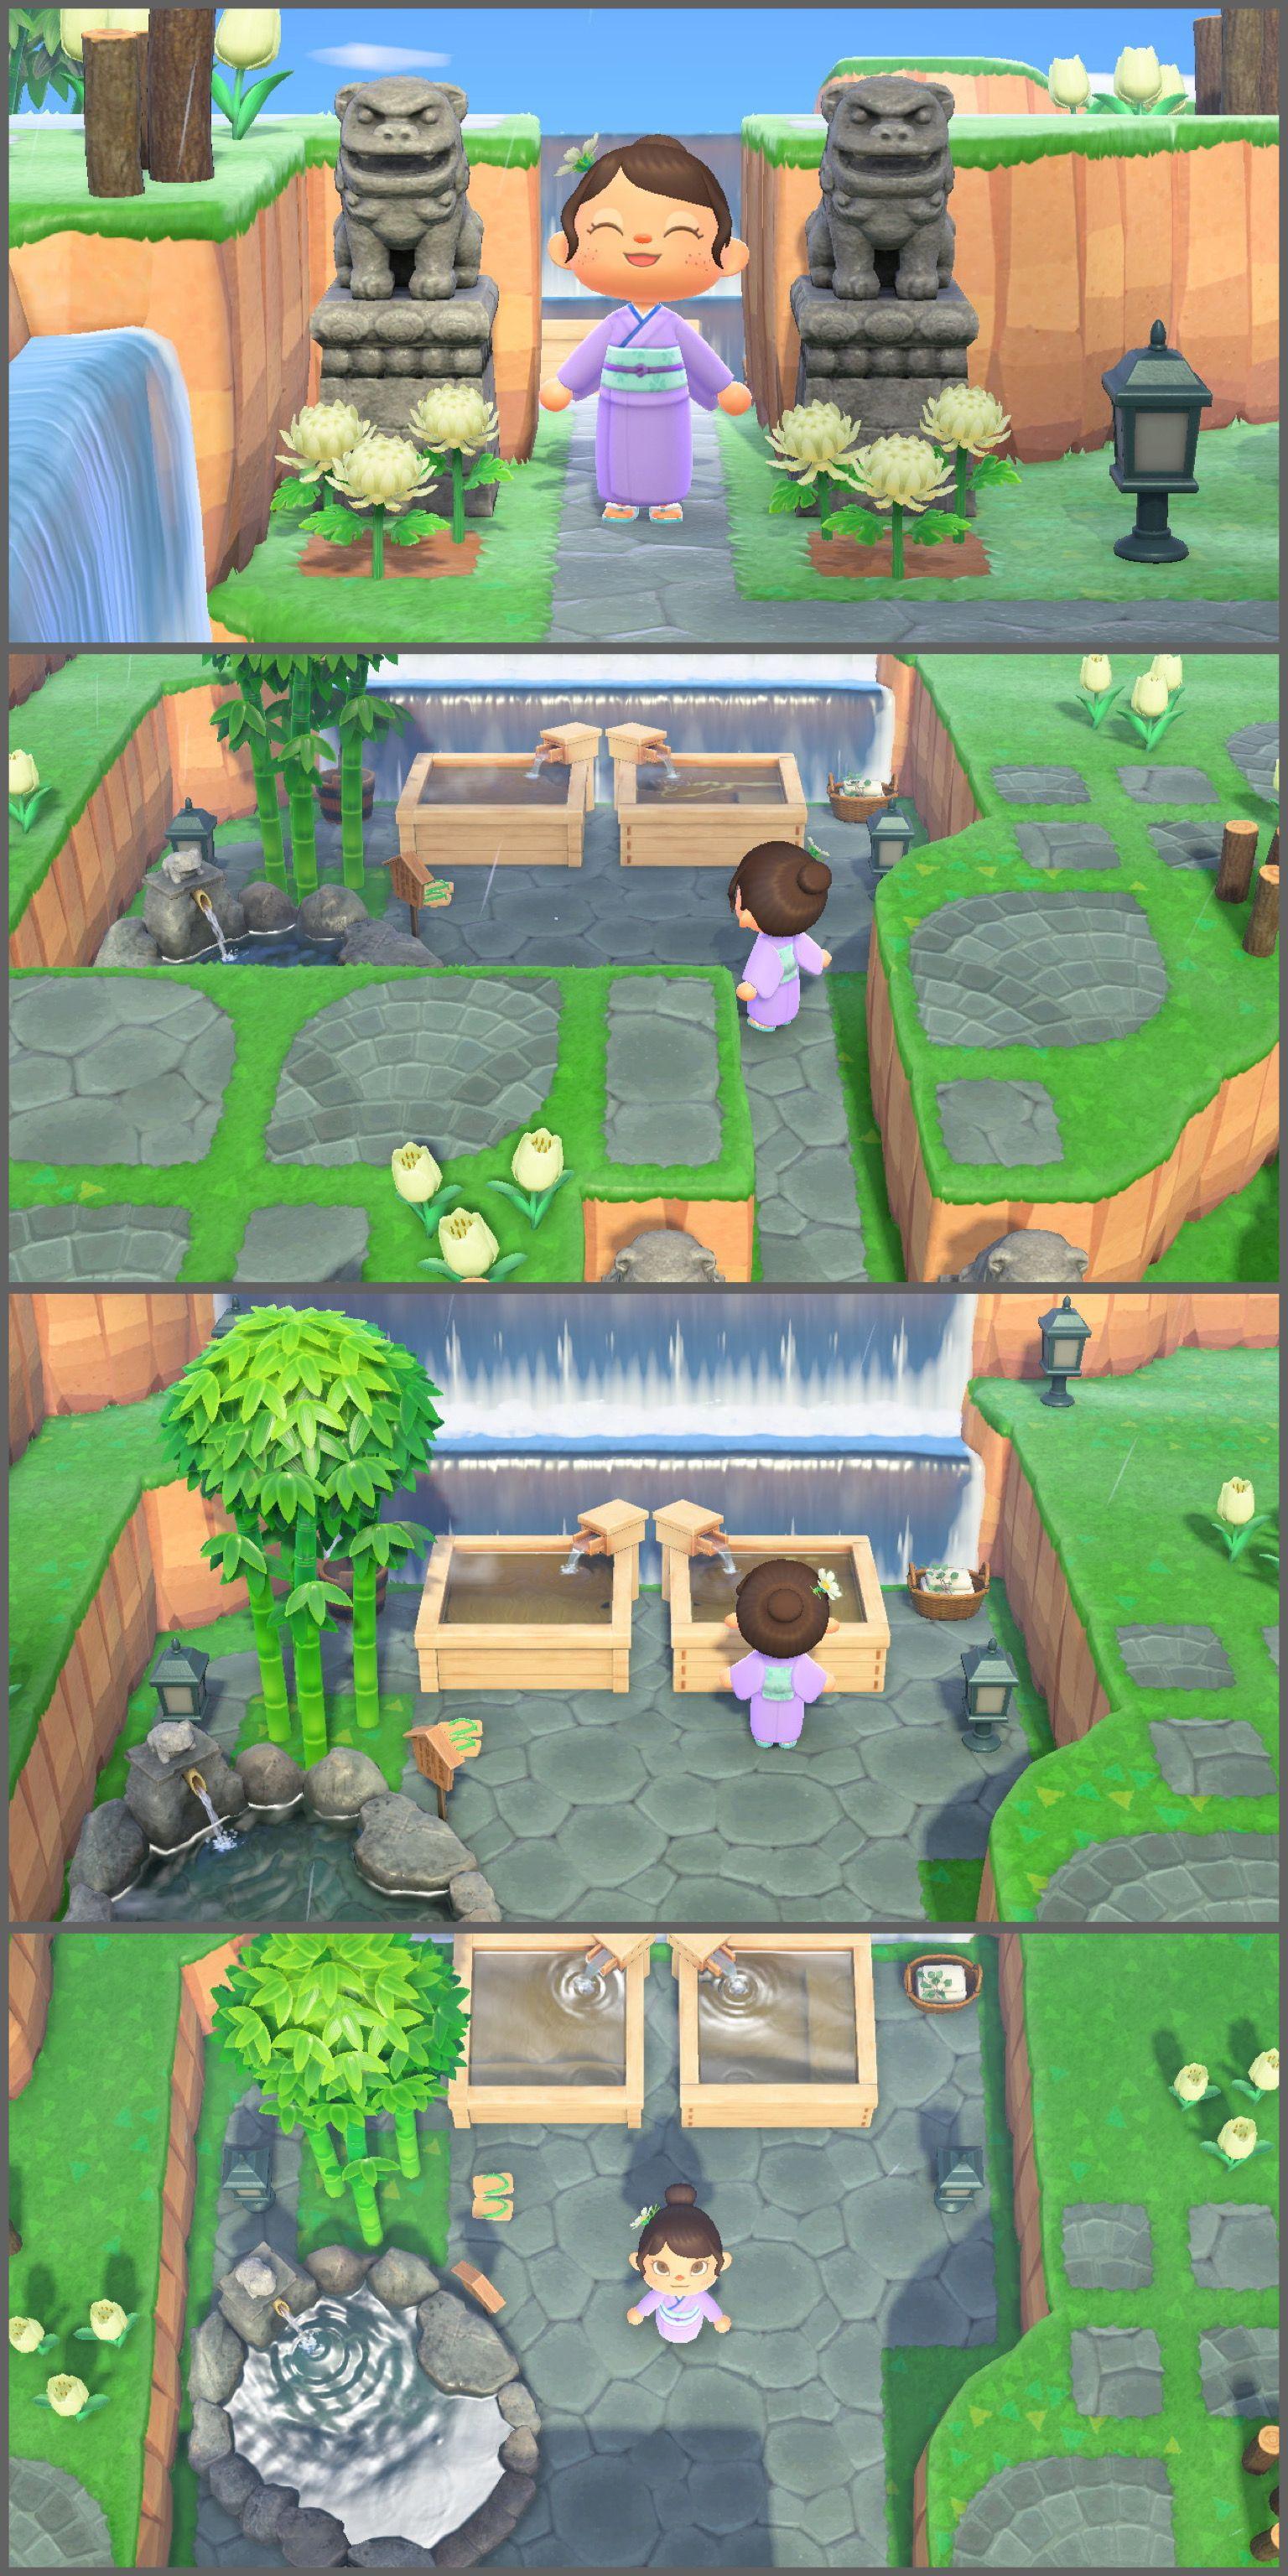 Acnh Secret Hot Spring Japanese Animals New Animal Crossing Animal Crossing Game